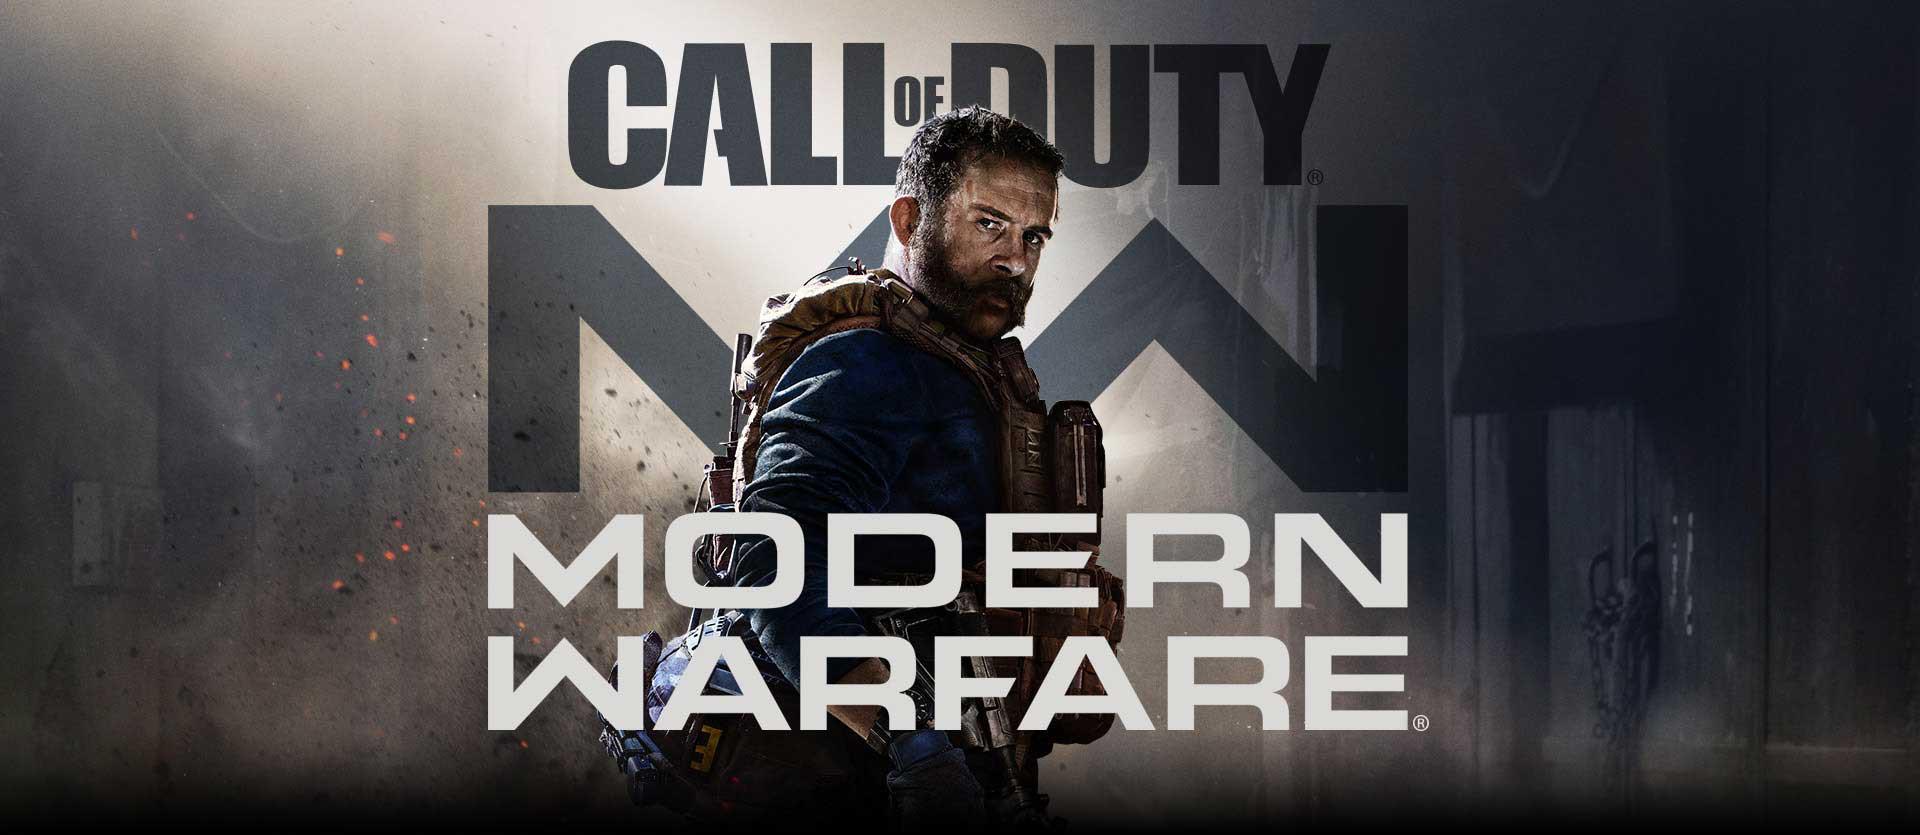 Call of Duty Modern Warfare 2019 04 - بازی Call of Duty: Modern Warfare مخصوص Xbox One